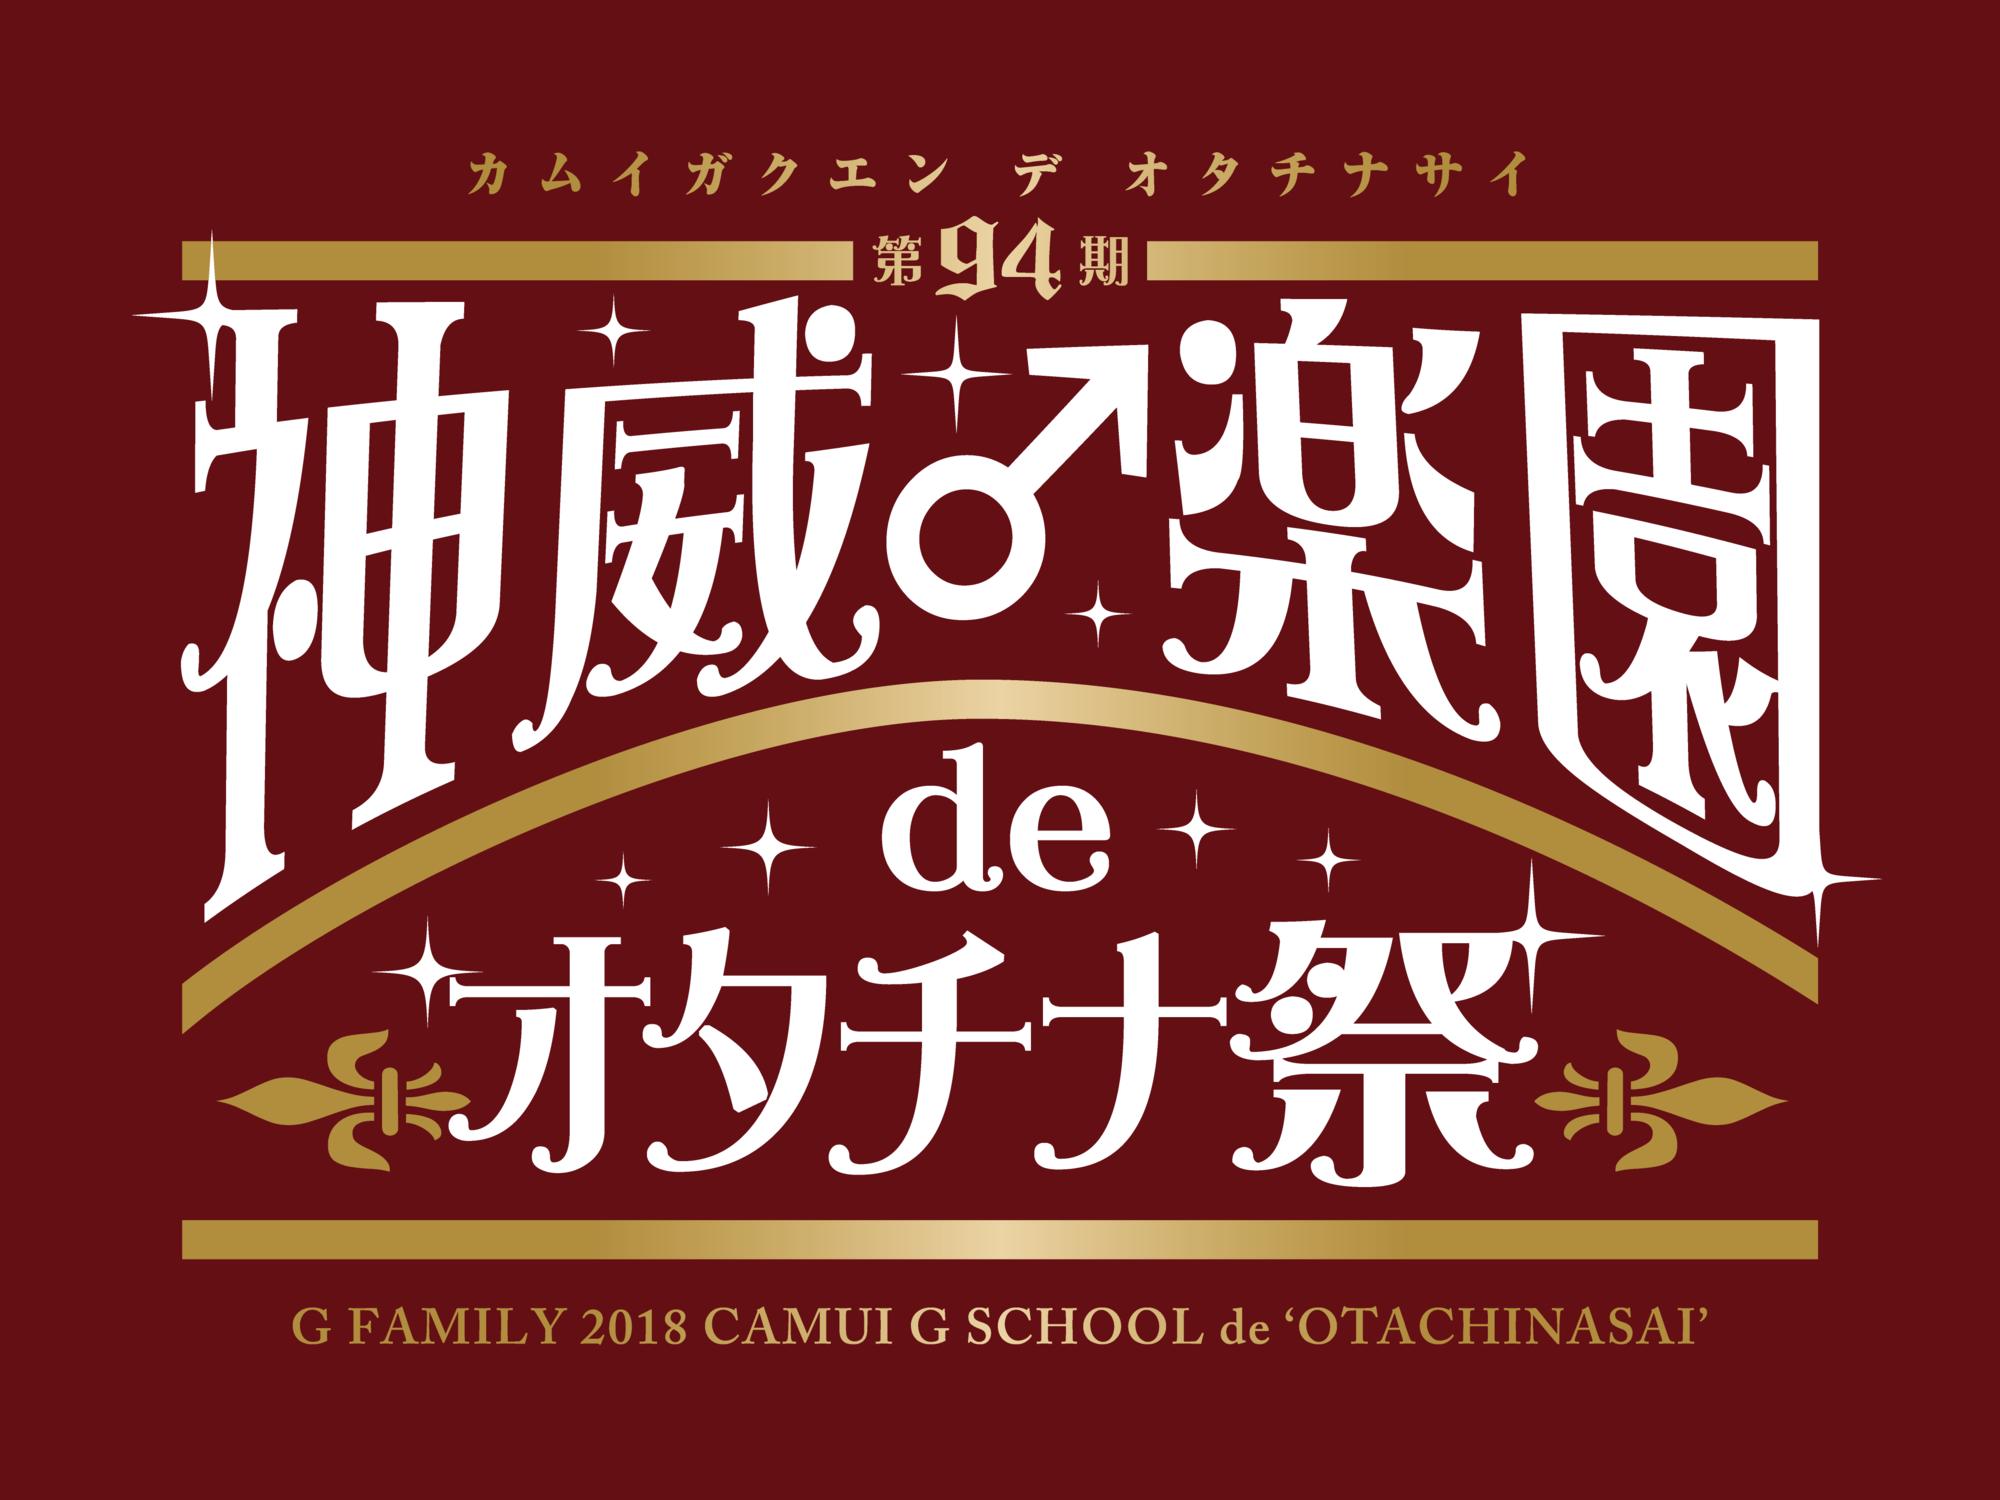 content_オタチナ祭logo.png